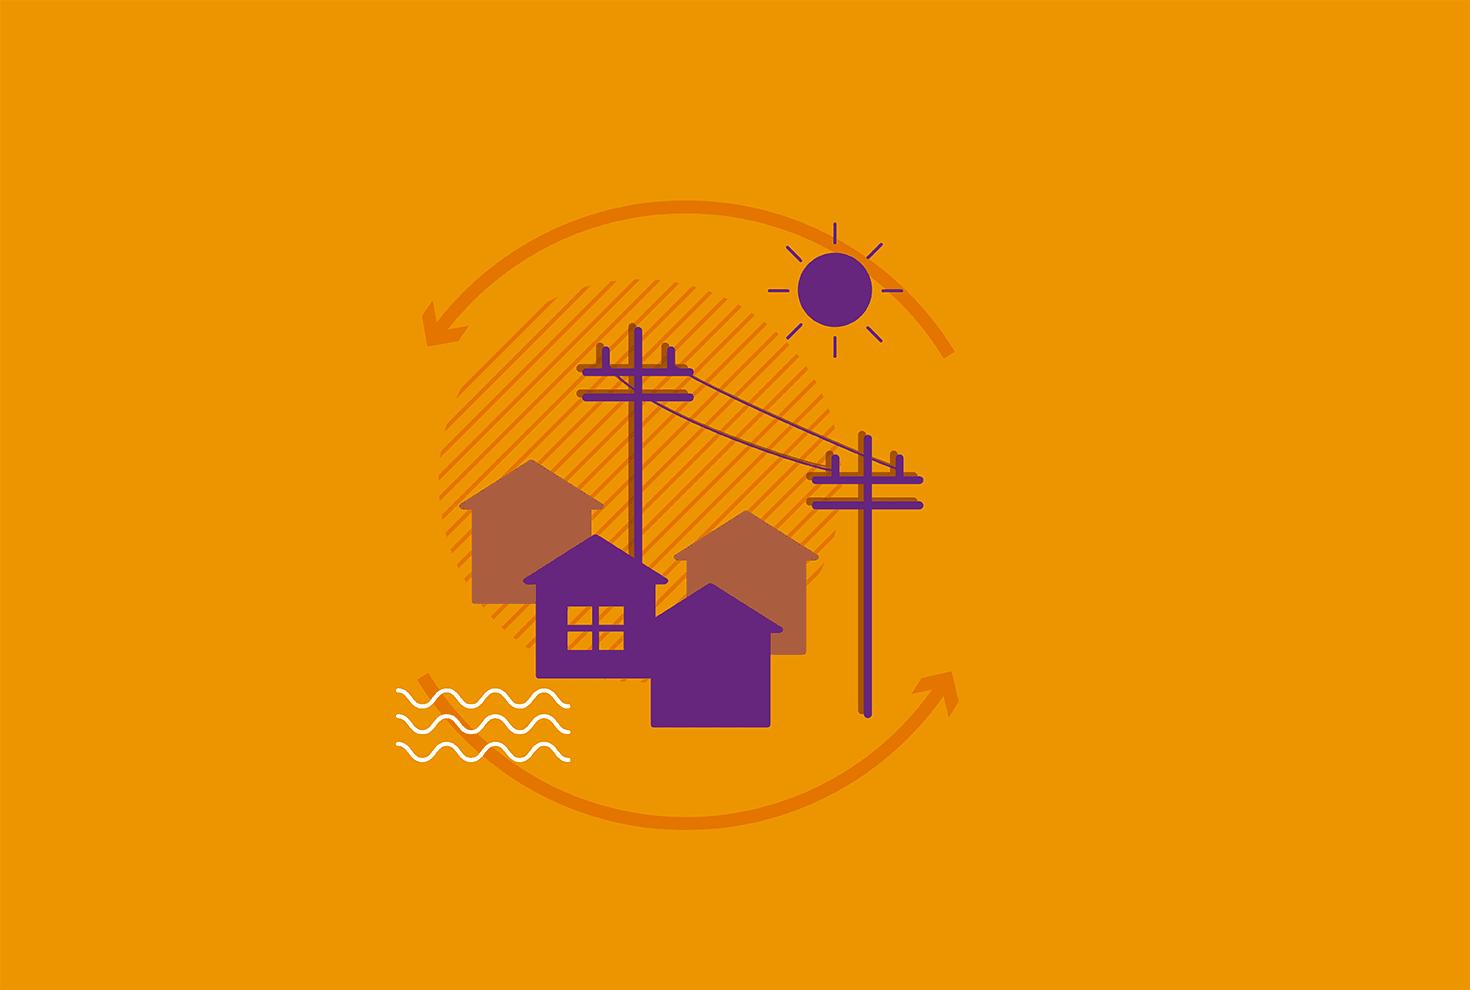 wachsender-energiebedarf-01